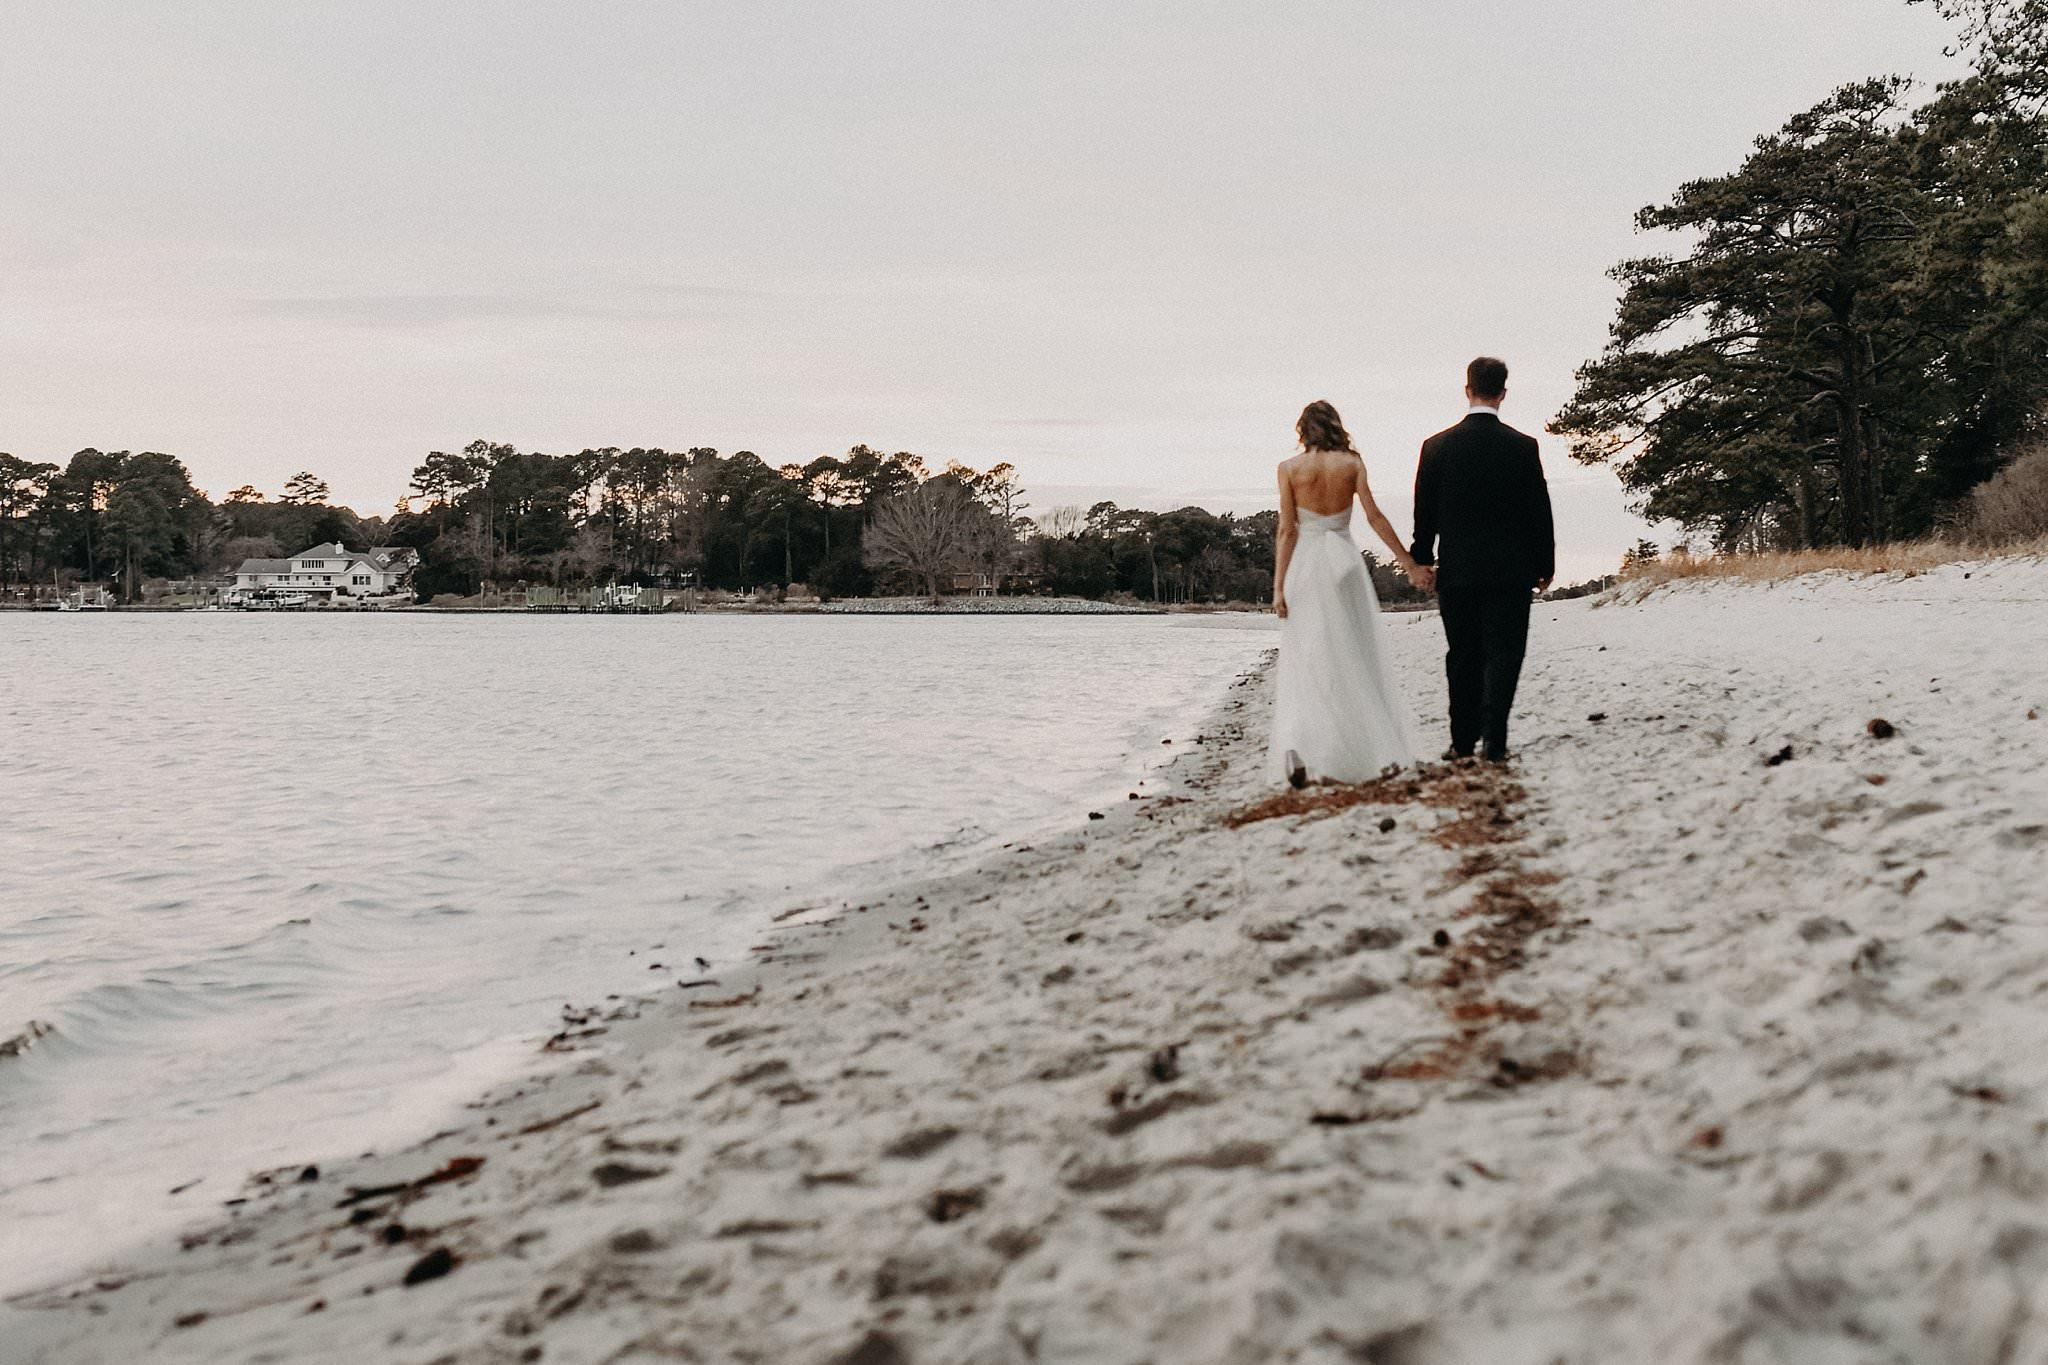 Bride-and-groom-stroll-the-beach-hampton-roads-wedding-photographer-melissa-bliss-photography.jpg